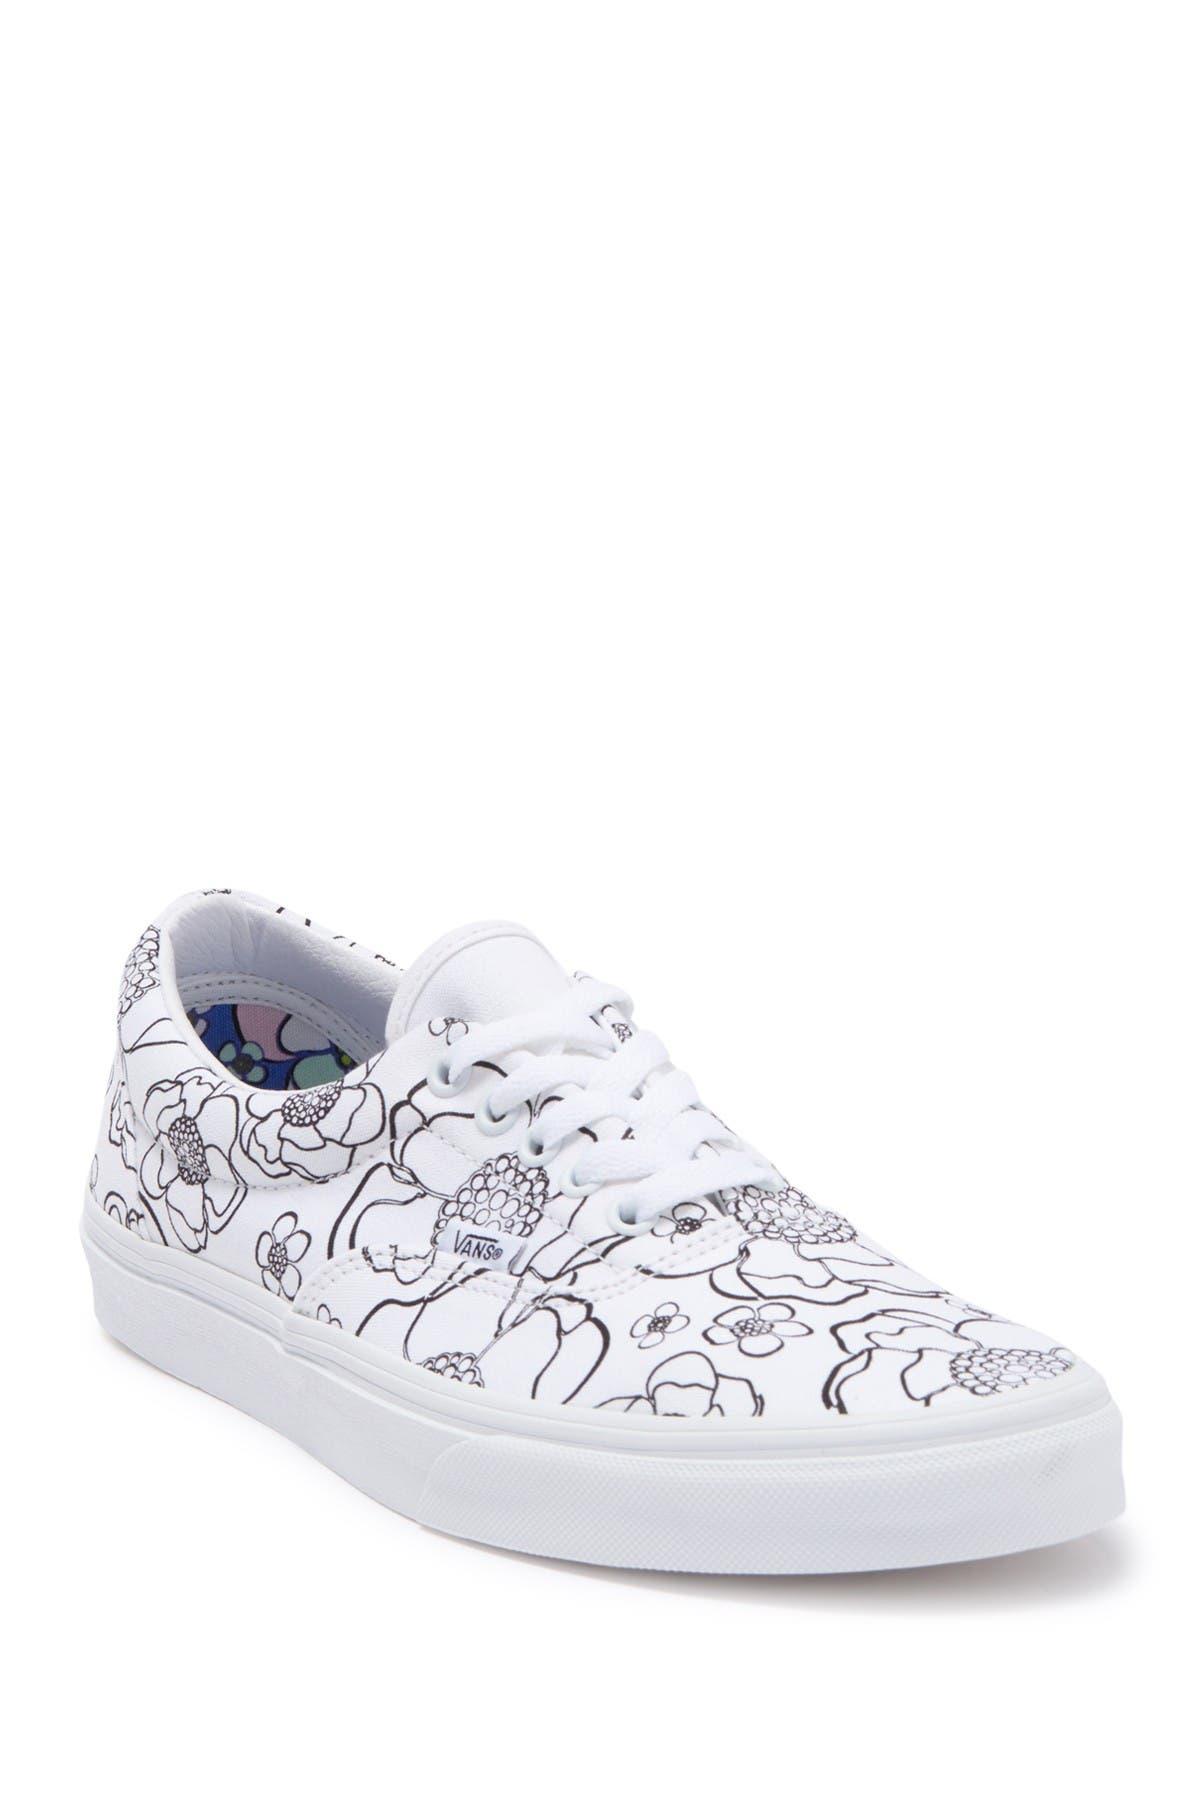 Vans Era U Color Flora Sneaker In U-color